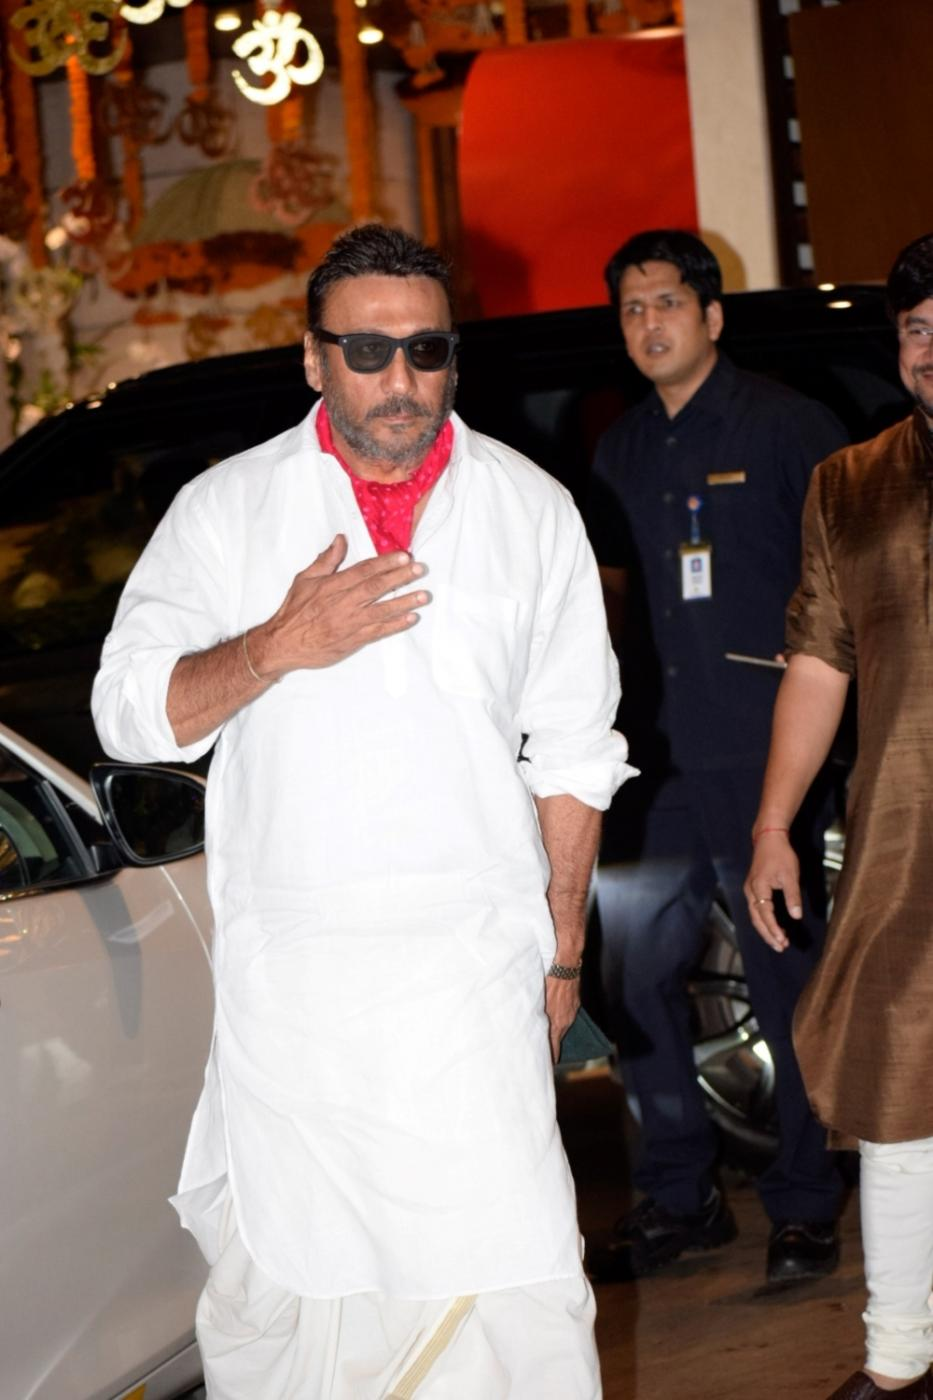 Mumbai: Actor Jackie Shroff arrives at Reliance Industries Chairman and MD Mukesh Ambani's residence to celebrate Ganesh Chaturthi in Mumbai on Sept 13, 2018. (Photo: IANS) by .